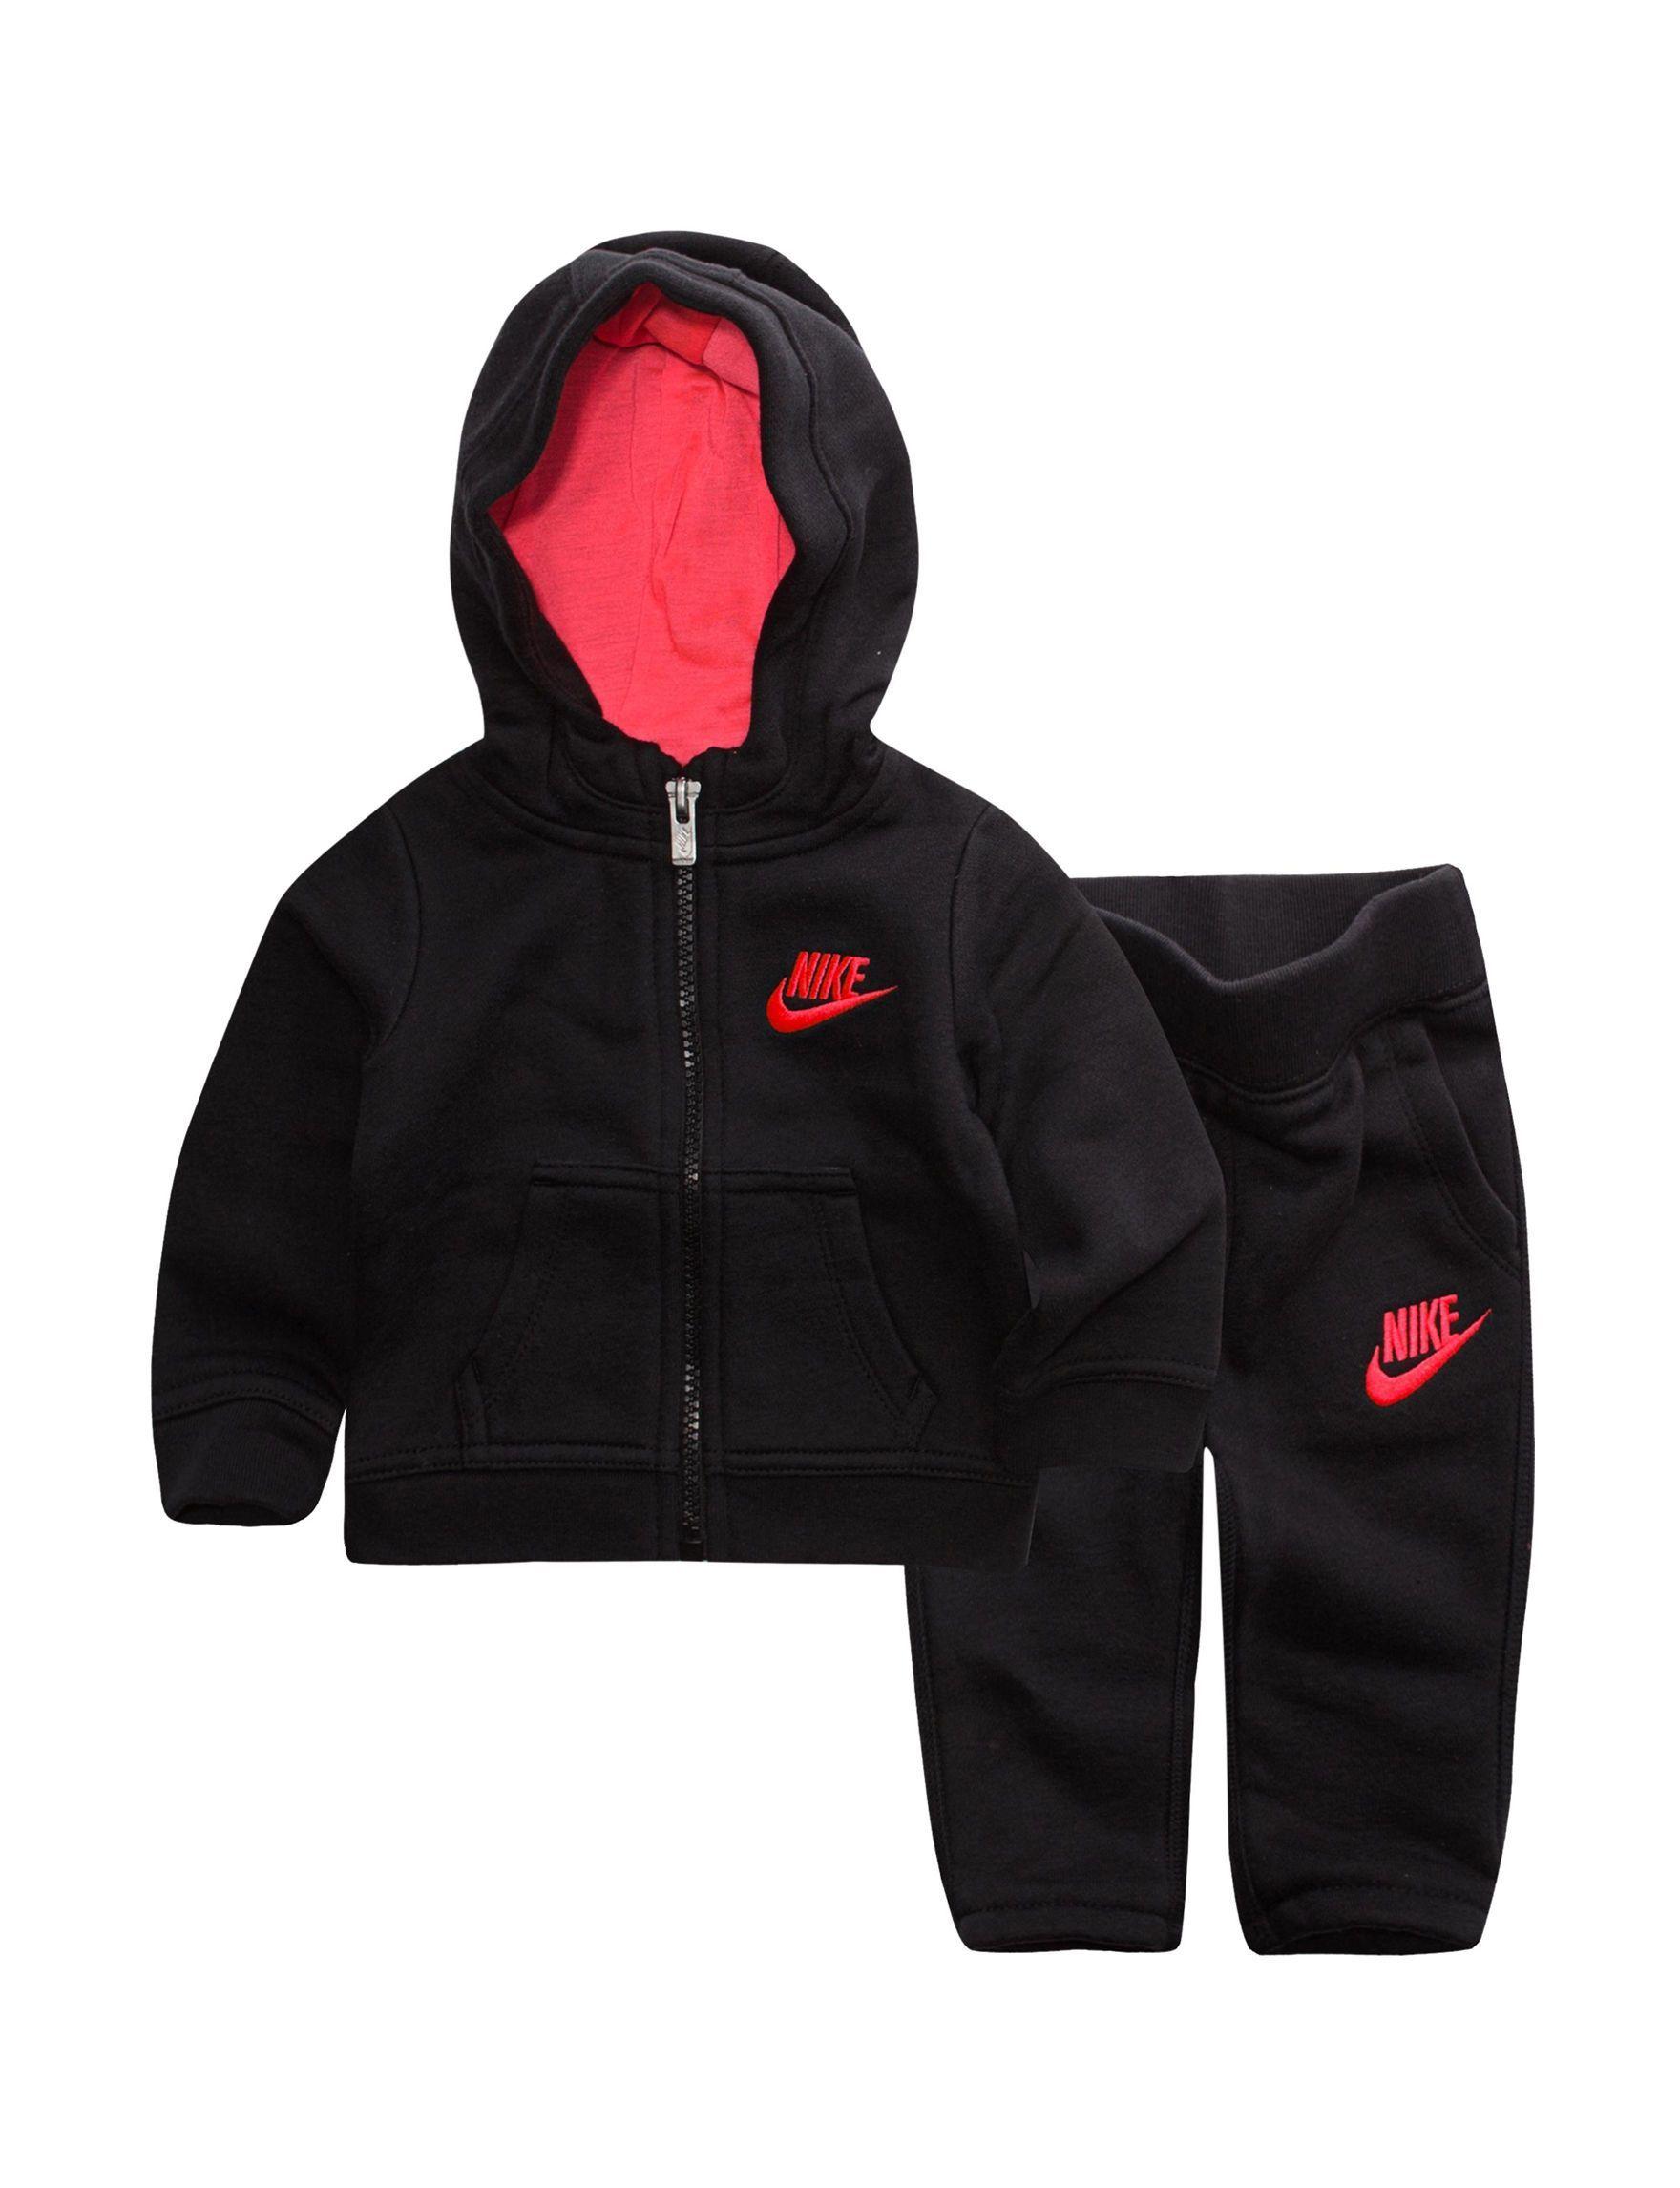 fe9cdd3a3147 Nike 2-pc. Futura Fleece Hoodie   Pants Set - Baby 12-24 Mos ...